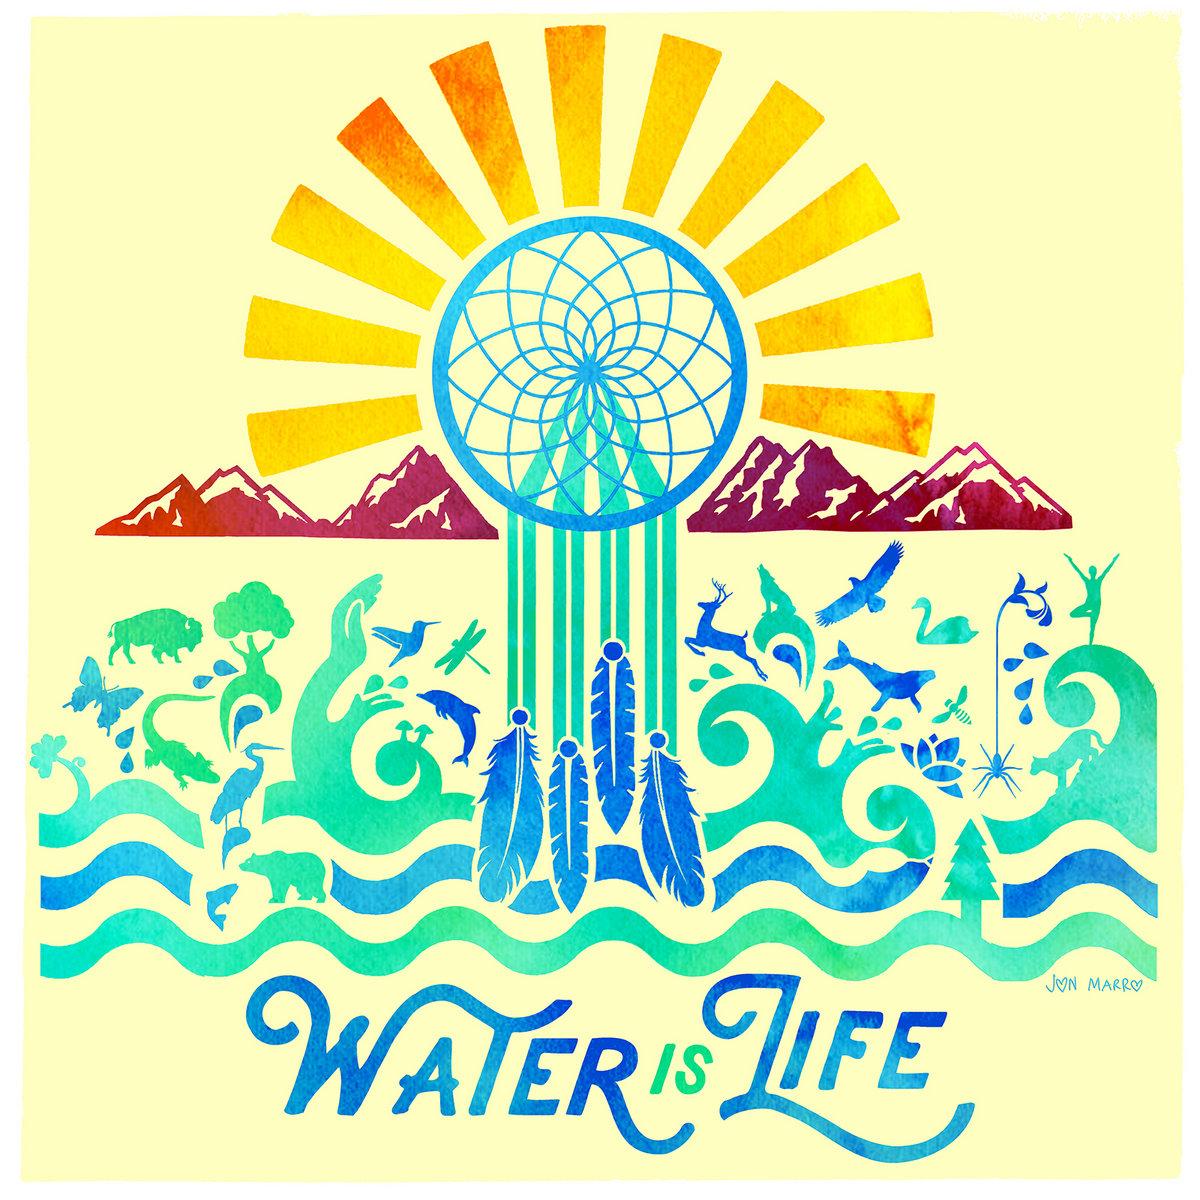 Agua Es Vida by Shireen Amini